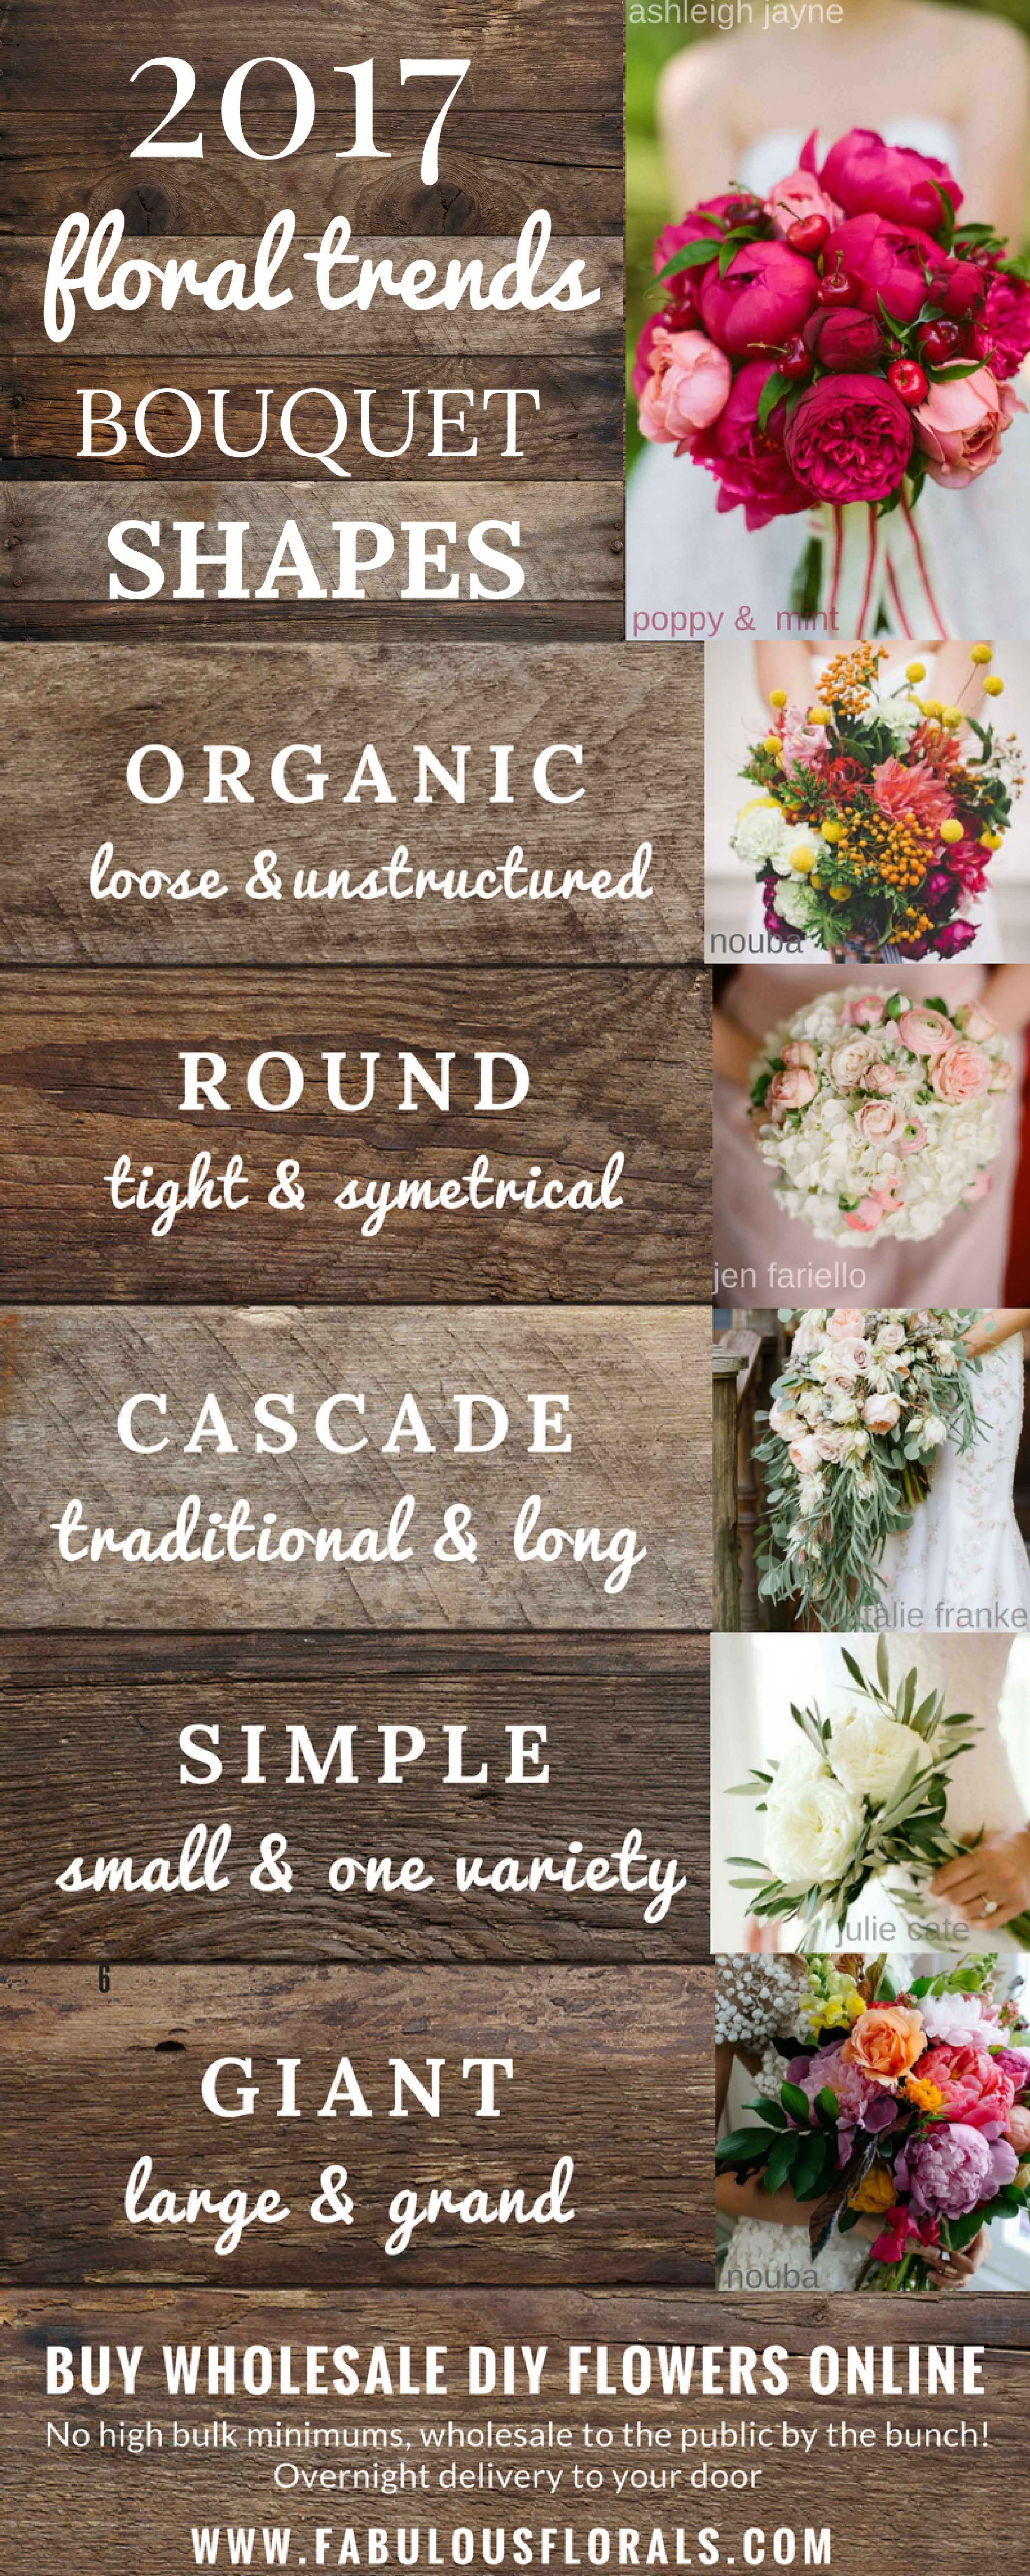 Diy Wedding Flower Tips And Tutorials Trends Fl Design How To Flowers